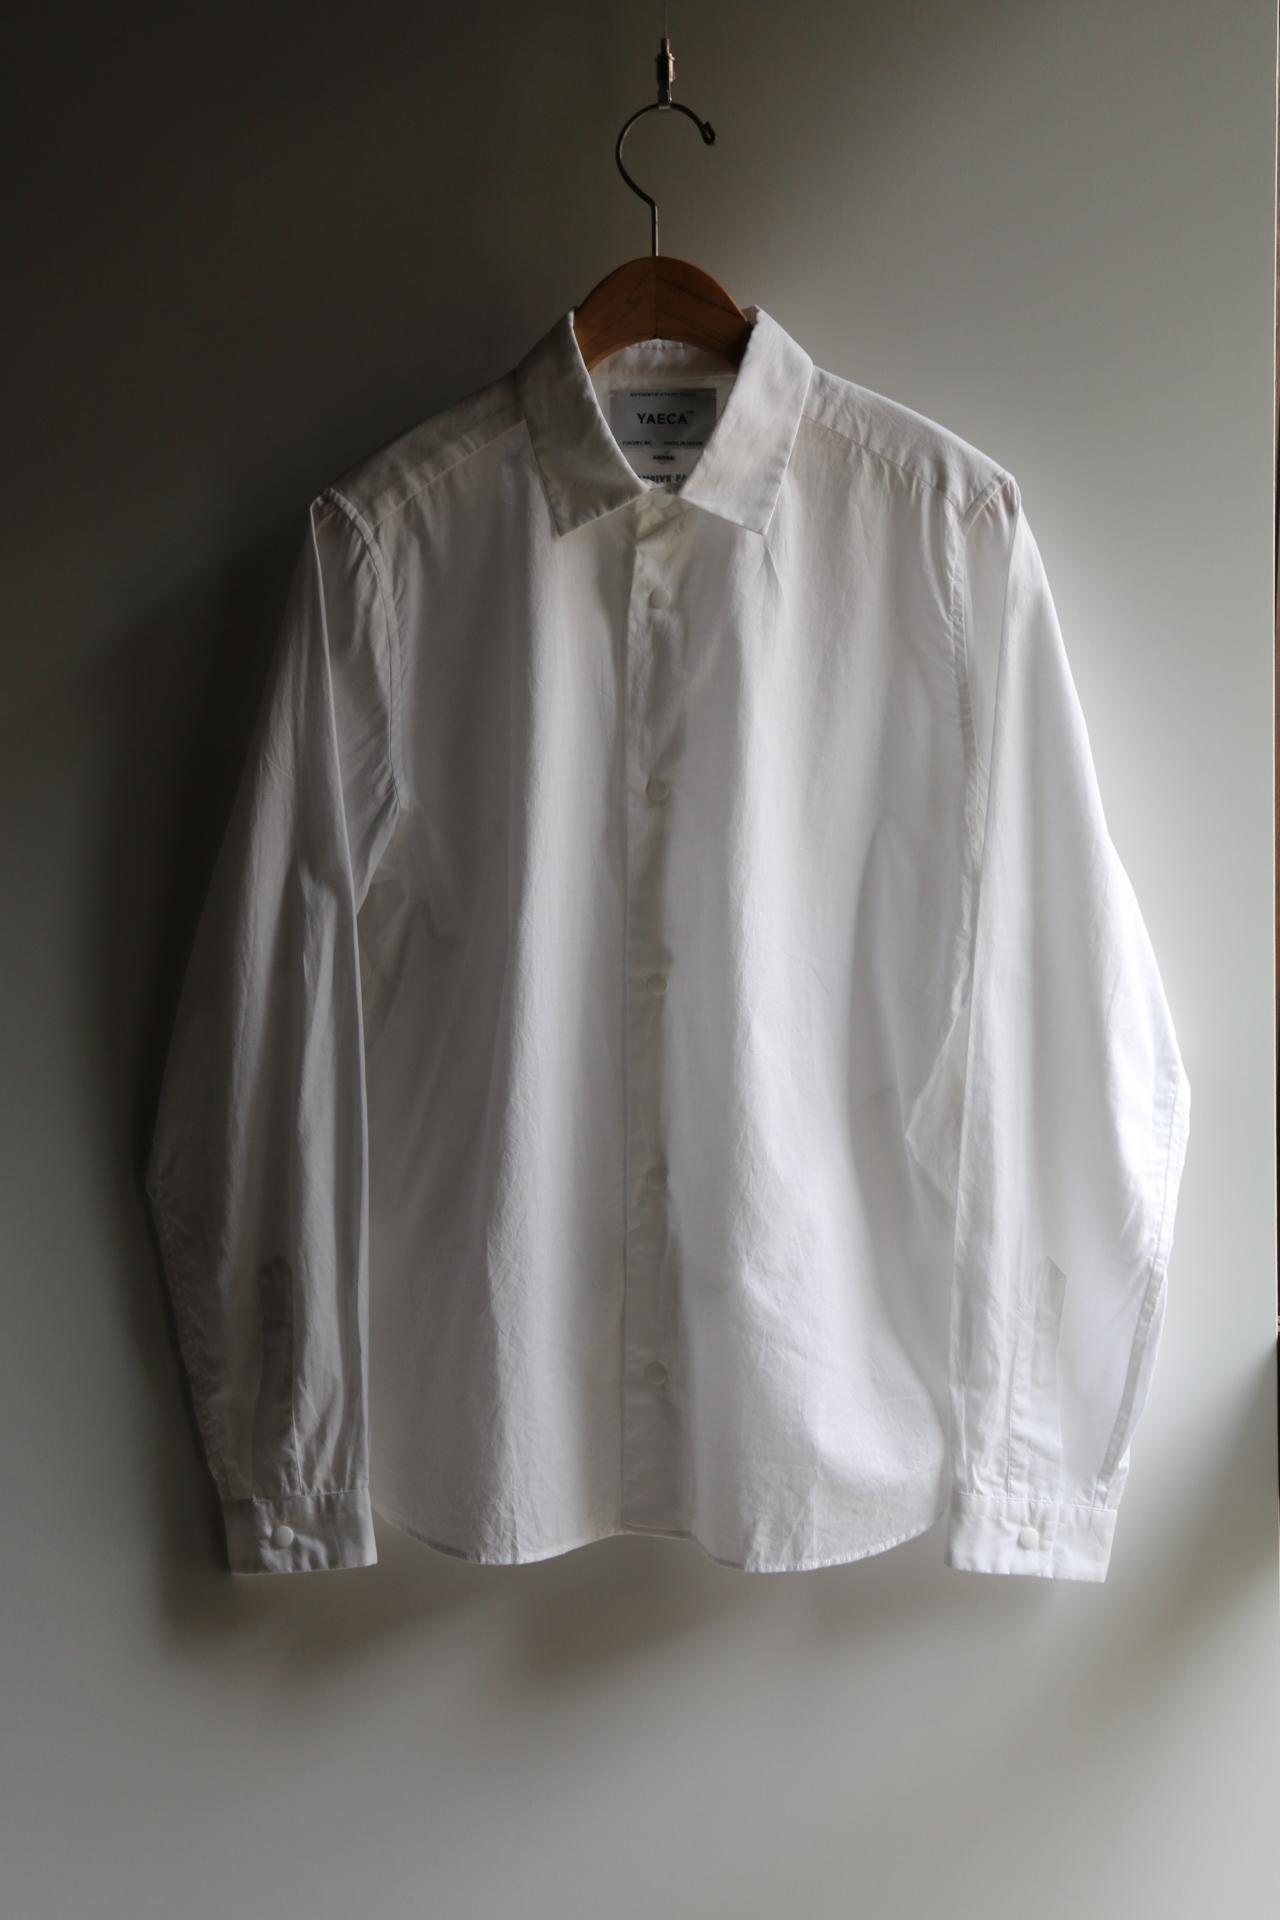 YAECAヤエカ コンフォートシャツ リラックス WHITE #67151